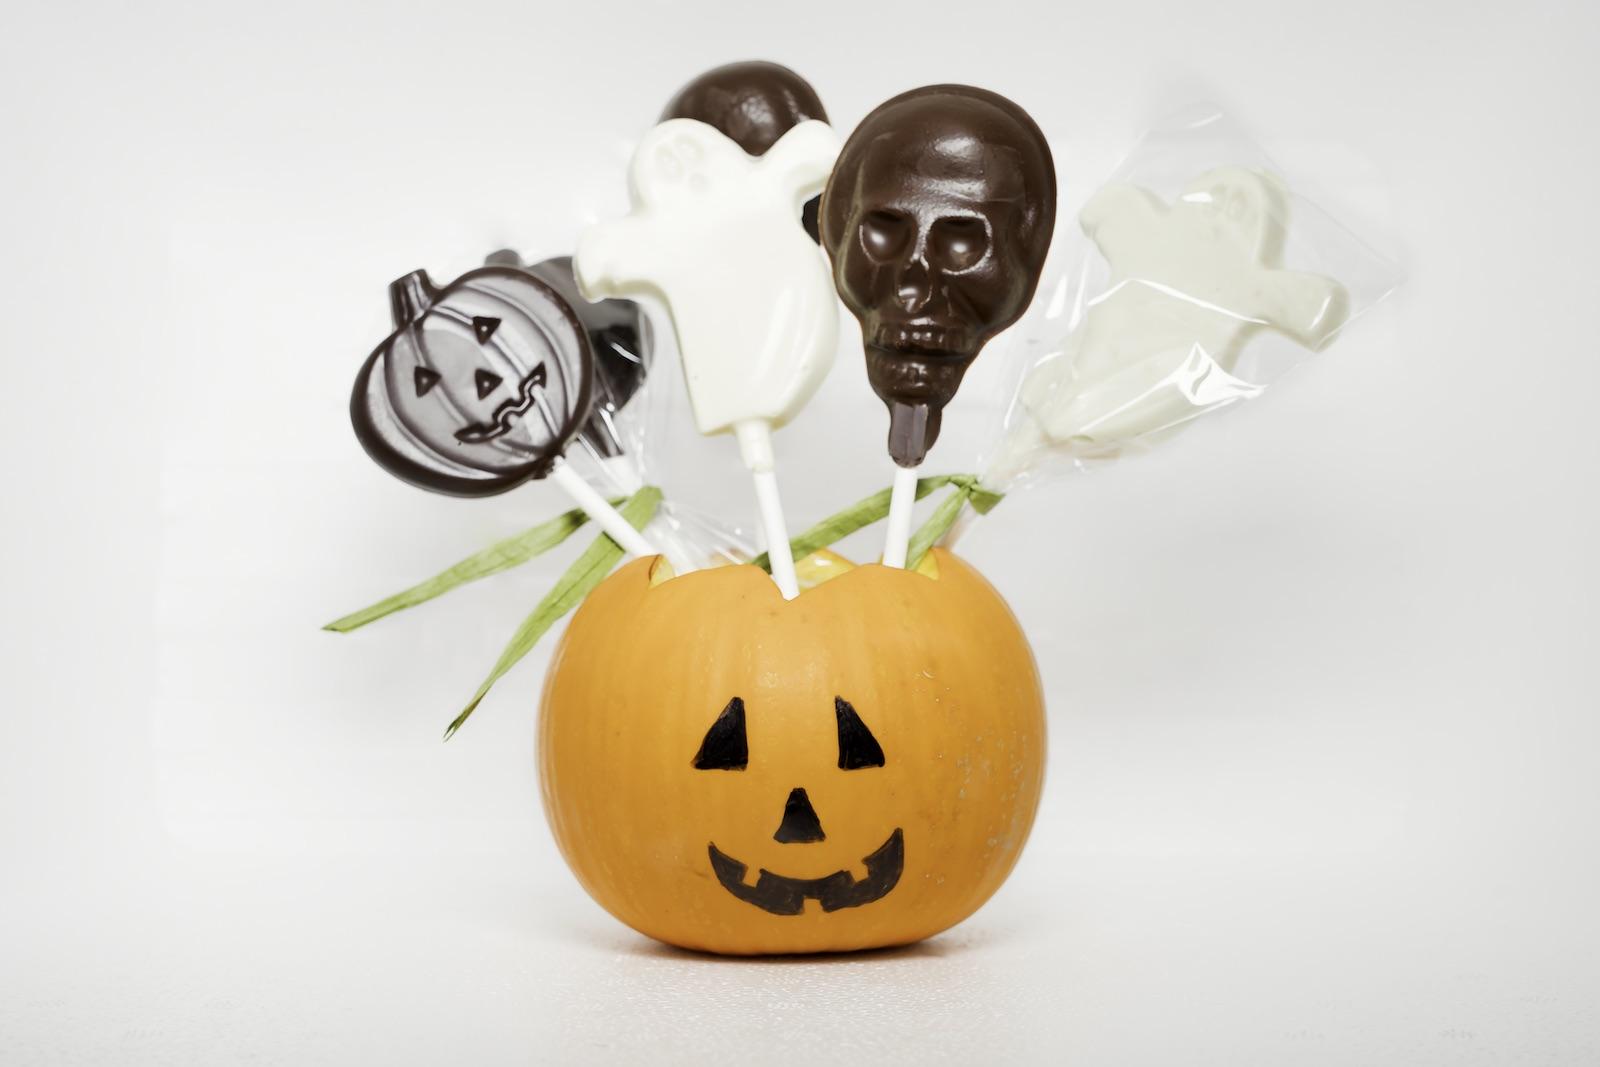 All-Natural Halloween Treats Ready at East Van Roasters